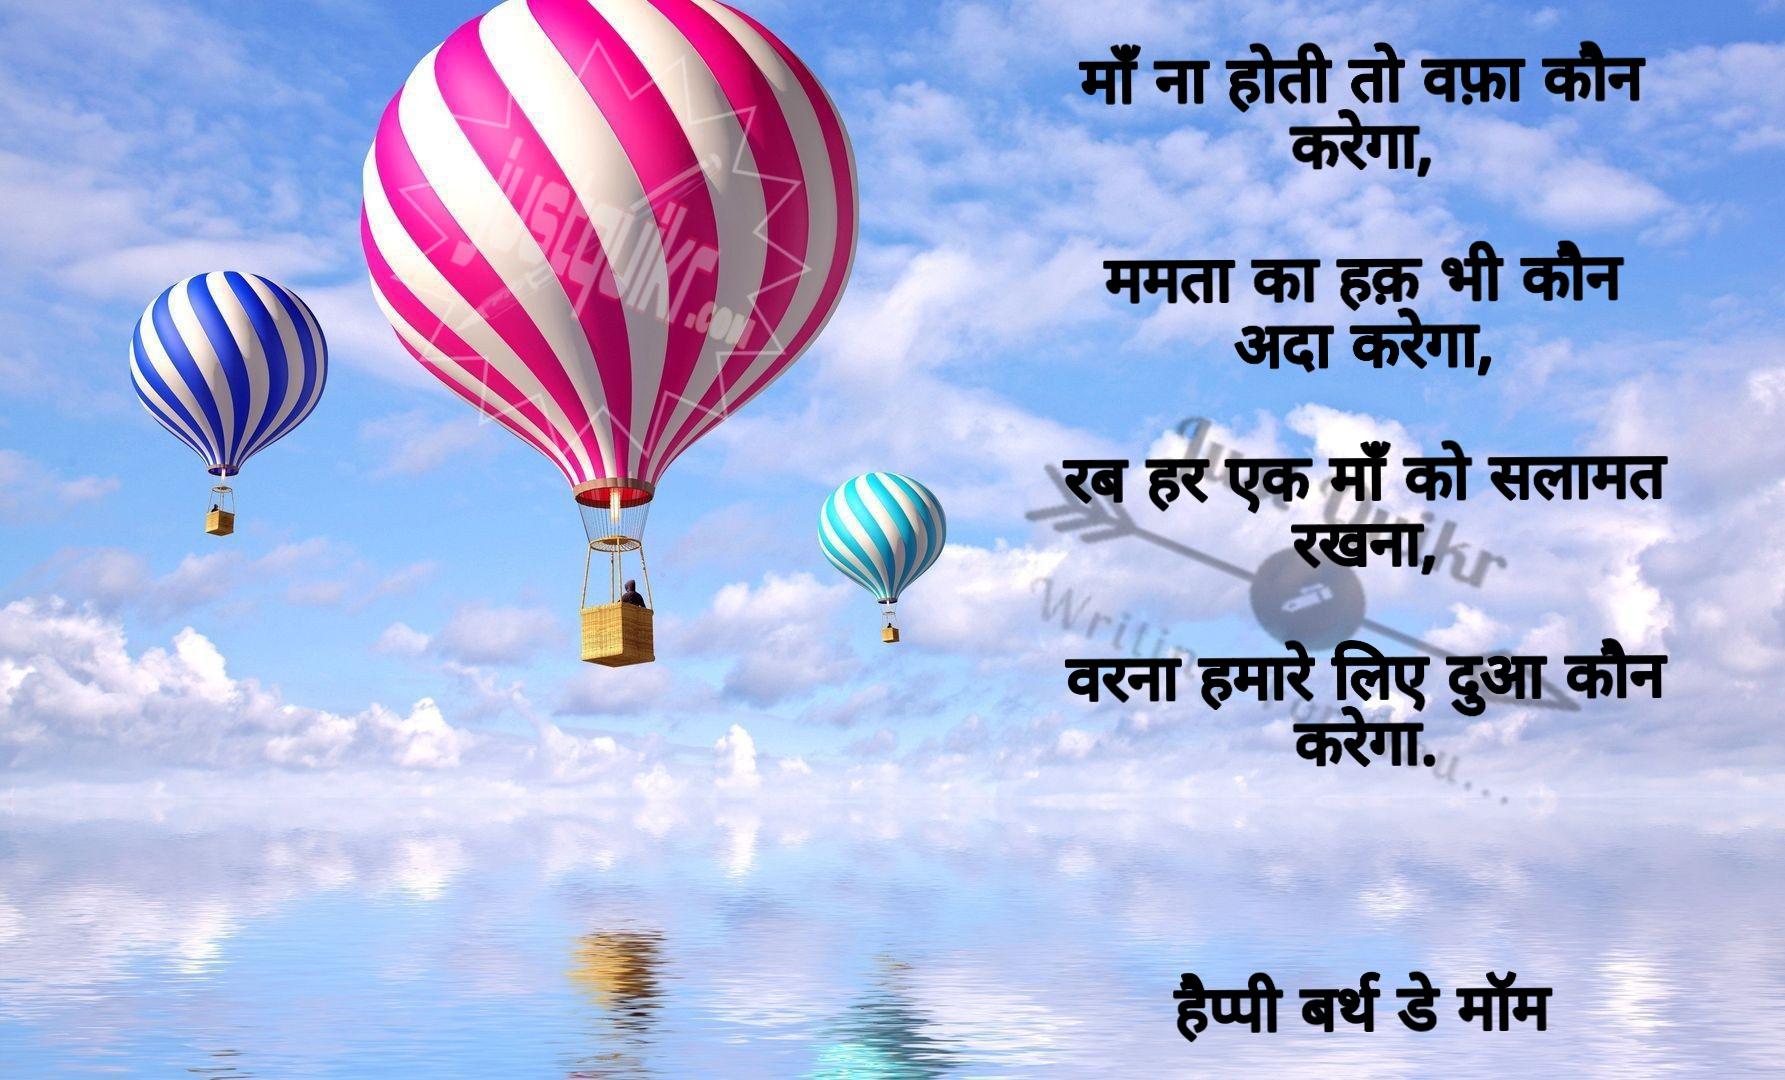 Happy Birthday Shayari Greetings Sayings SMS and Images for Mom in Hindi